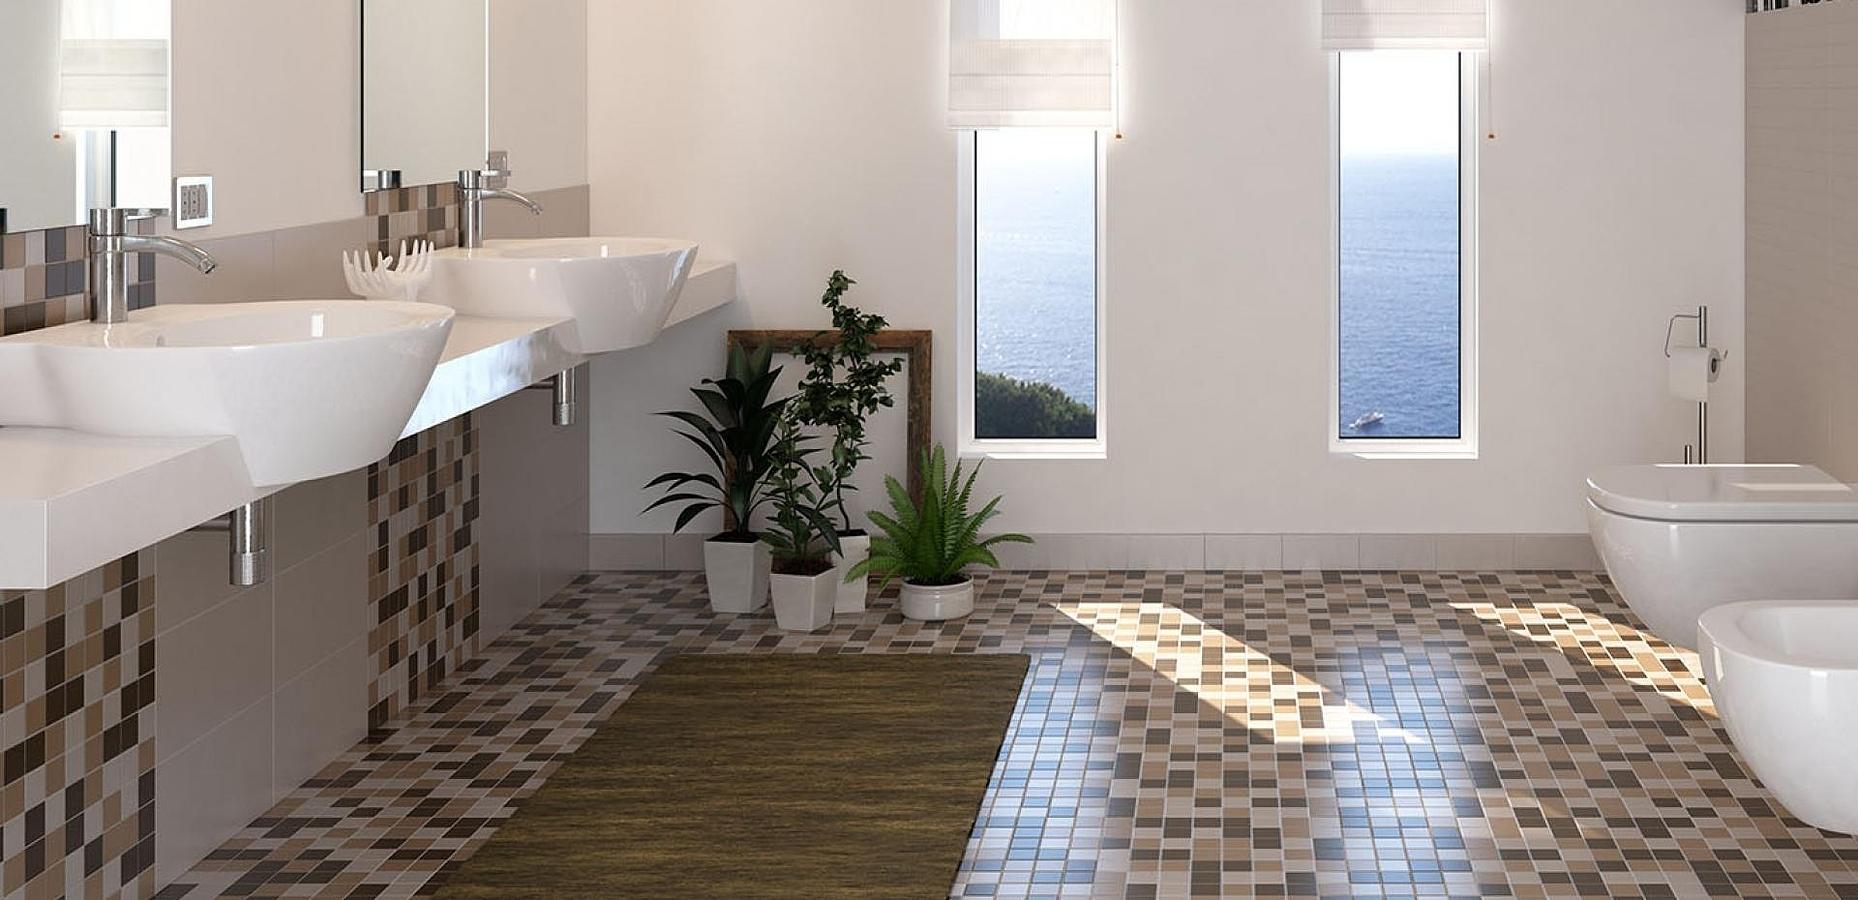 Ceramic Tiles By Ceramica Vogue Tile Expert Distributor Of